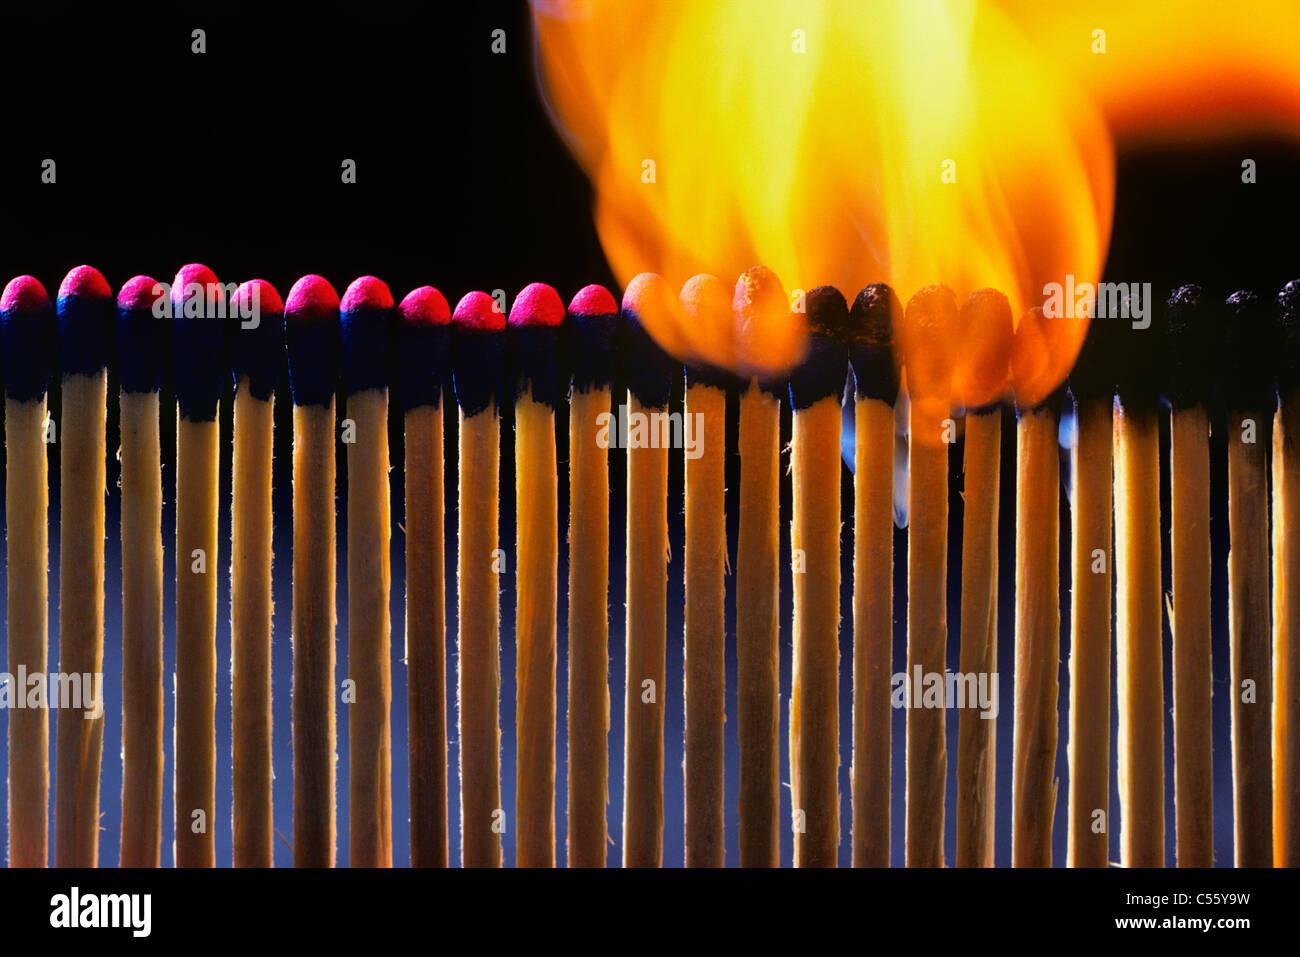 Burning matchsticks - Stock Image